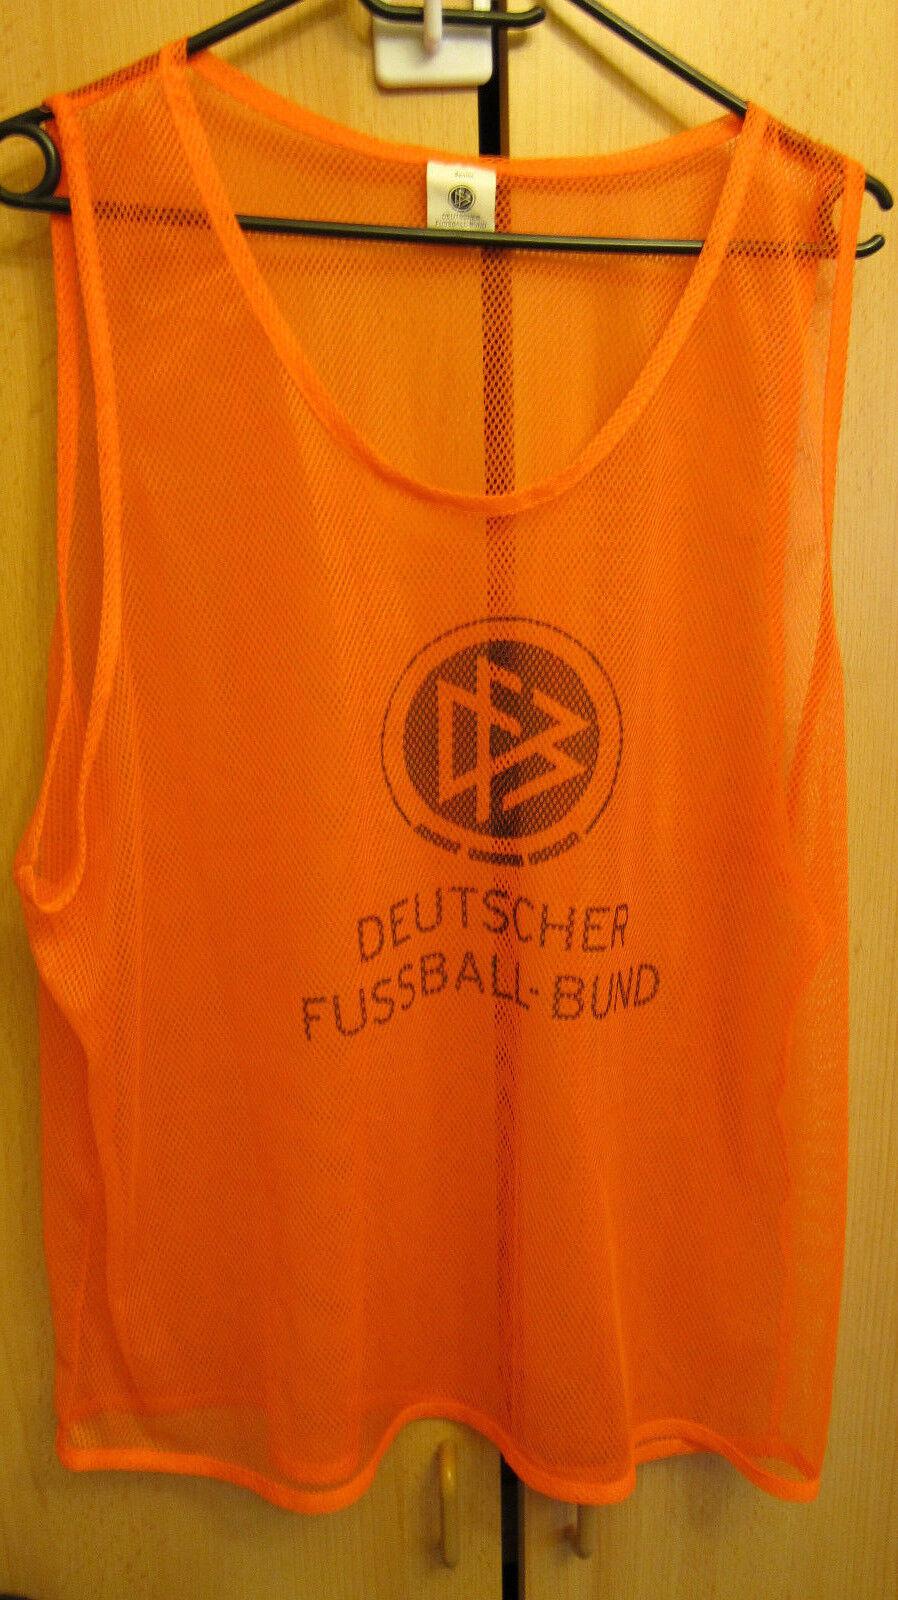 Deutschland Trikot Trikot Trikot Leibchen, matchworn DFB jersey maglia,maillot, top 2018 798803